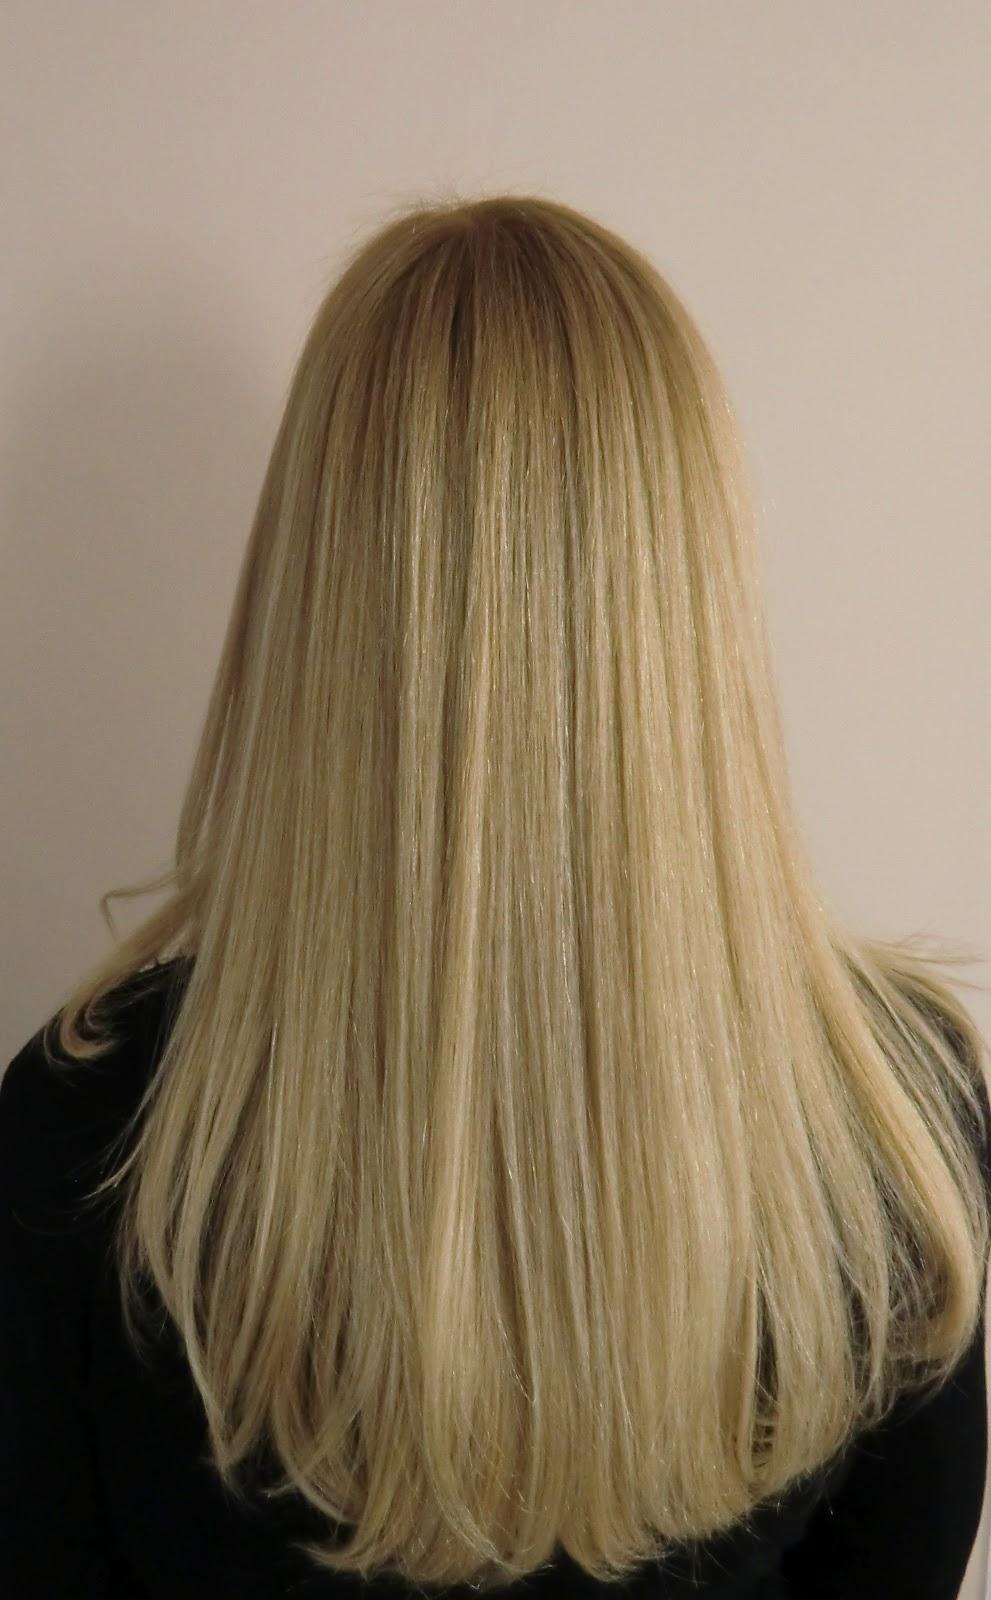 salon katrin cannington beautiful blondes sch ne blondt ne. Black Bedroom Furniture Sets. Home Design Ideas